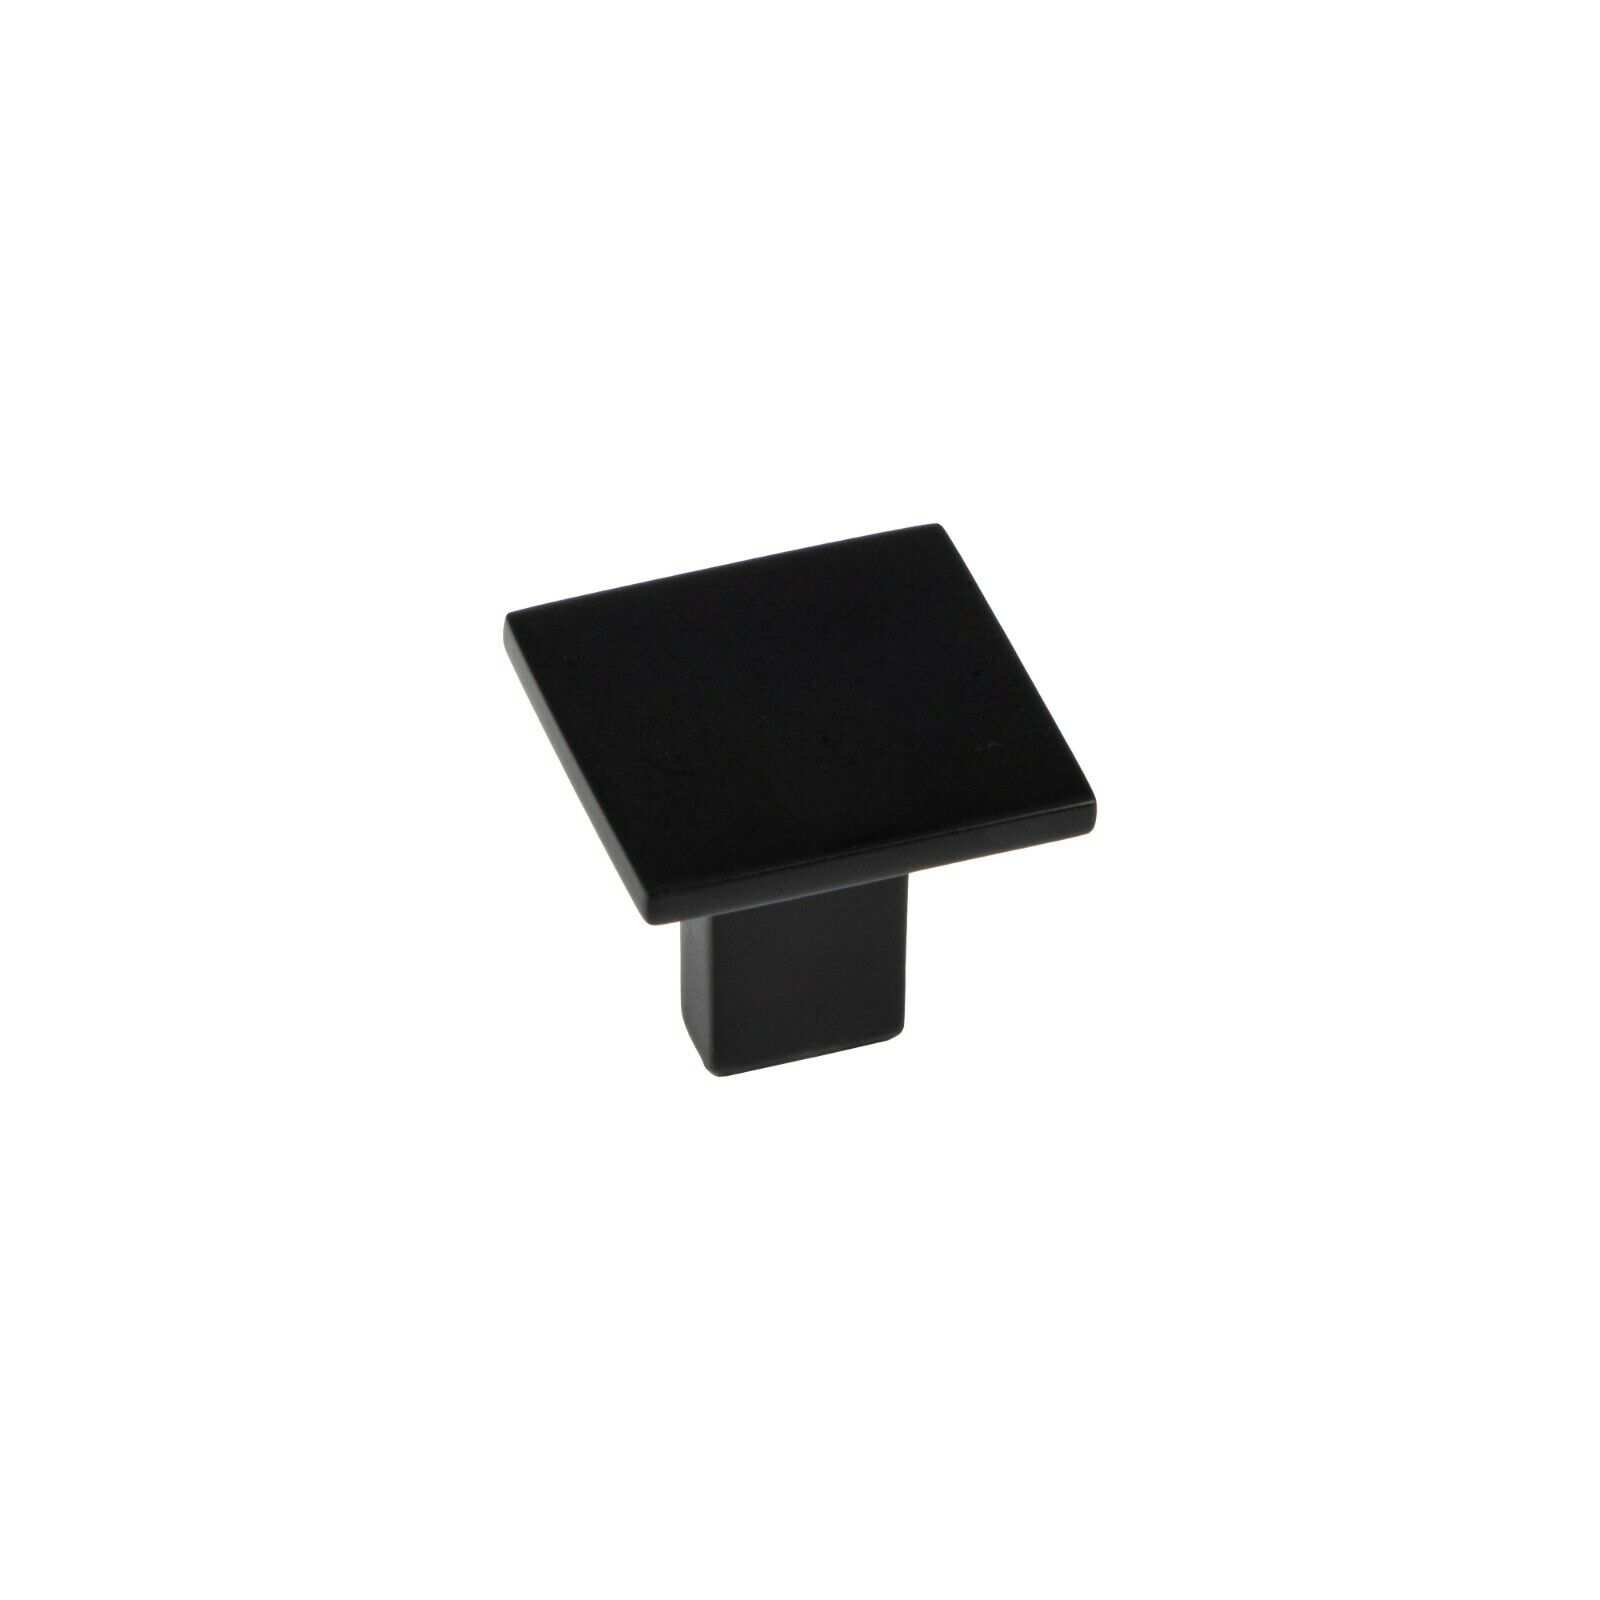 Bouton De Meuble Noir Cuisine Poignee Metal Carre Porte 28 X 28 Ebay